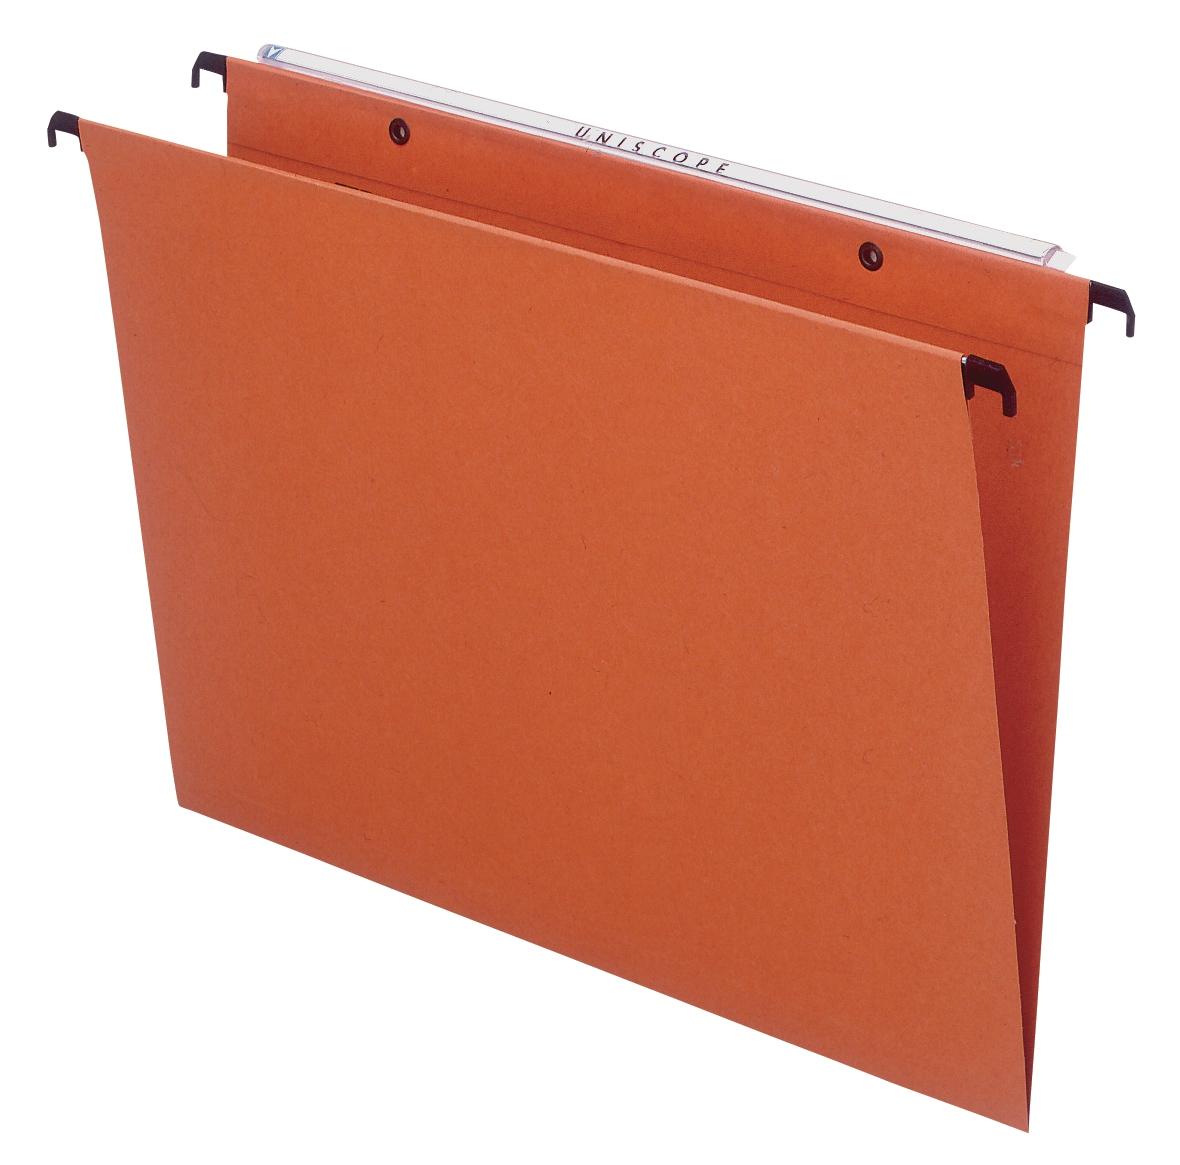 Bantex Linking Suspension File Manilla Square Base 30mm Capacity Foolscap Orange Ref 100330687 [Pack 25]